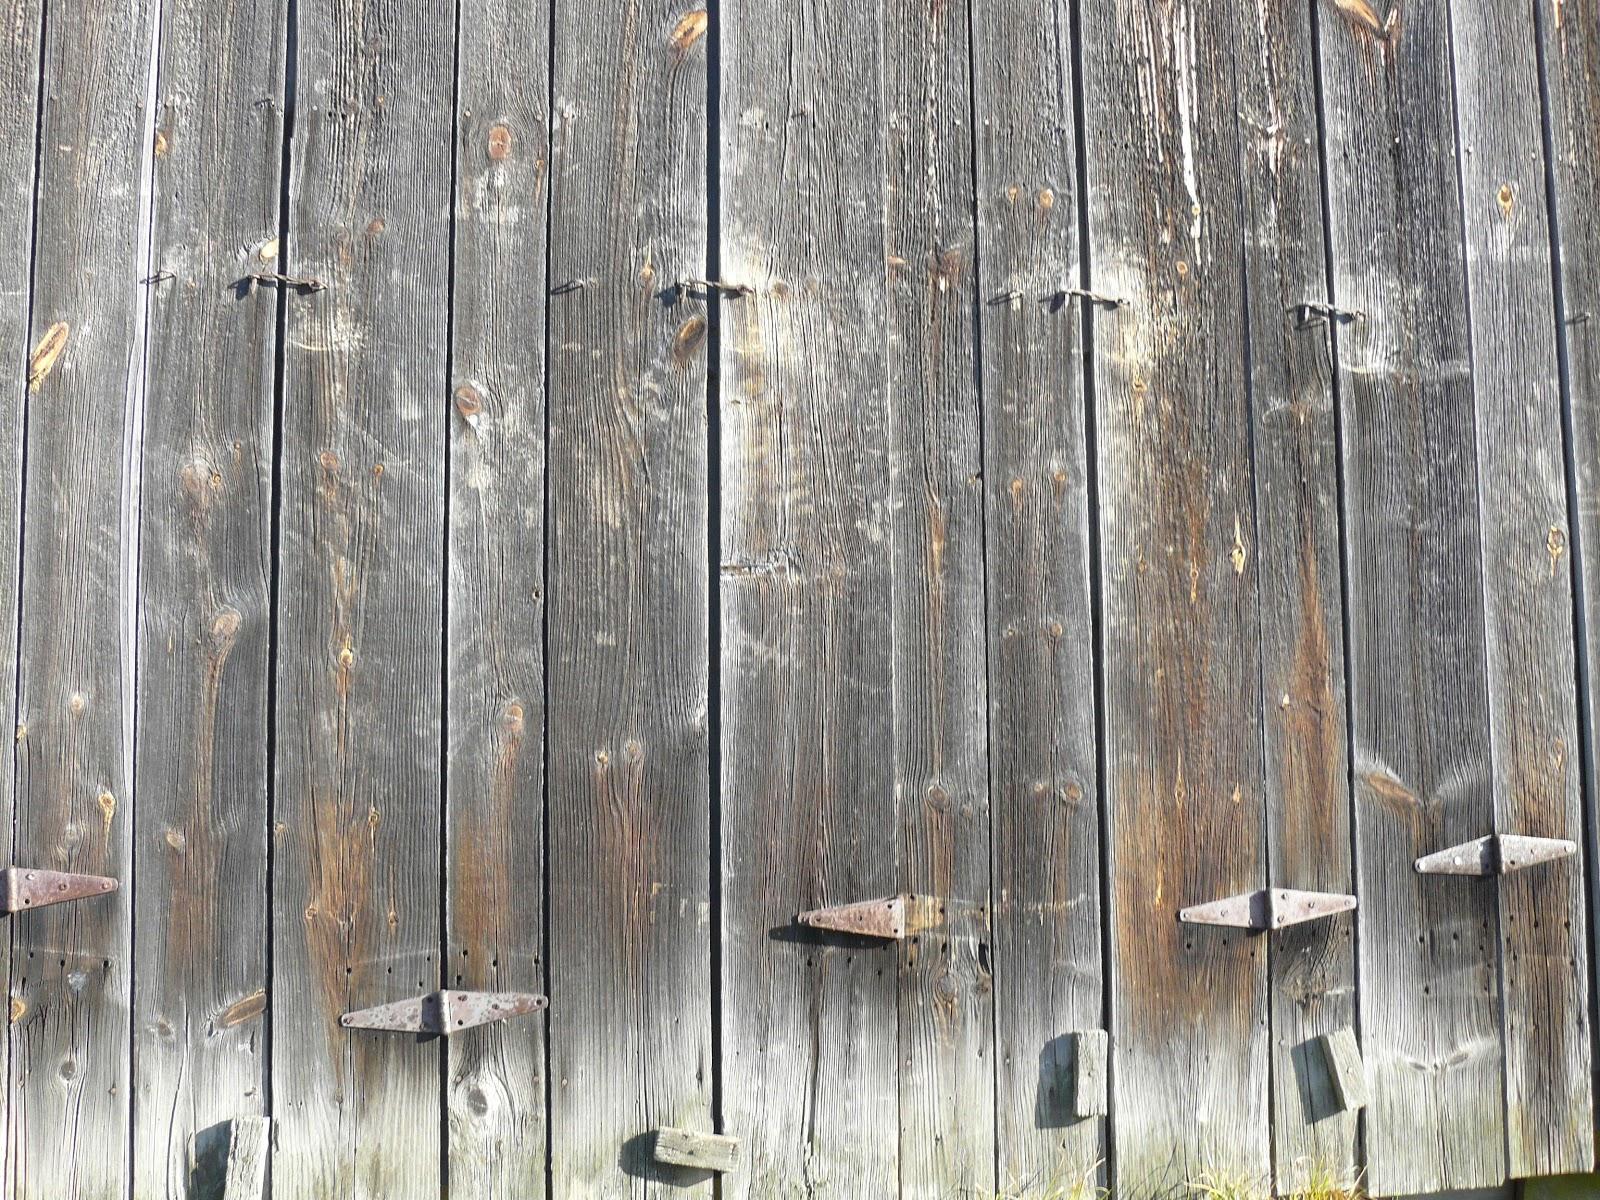 barn wood background - photo #24